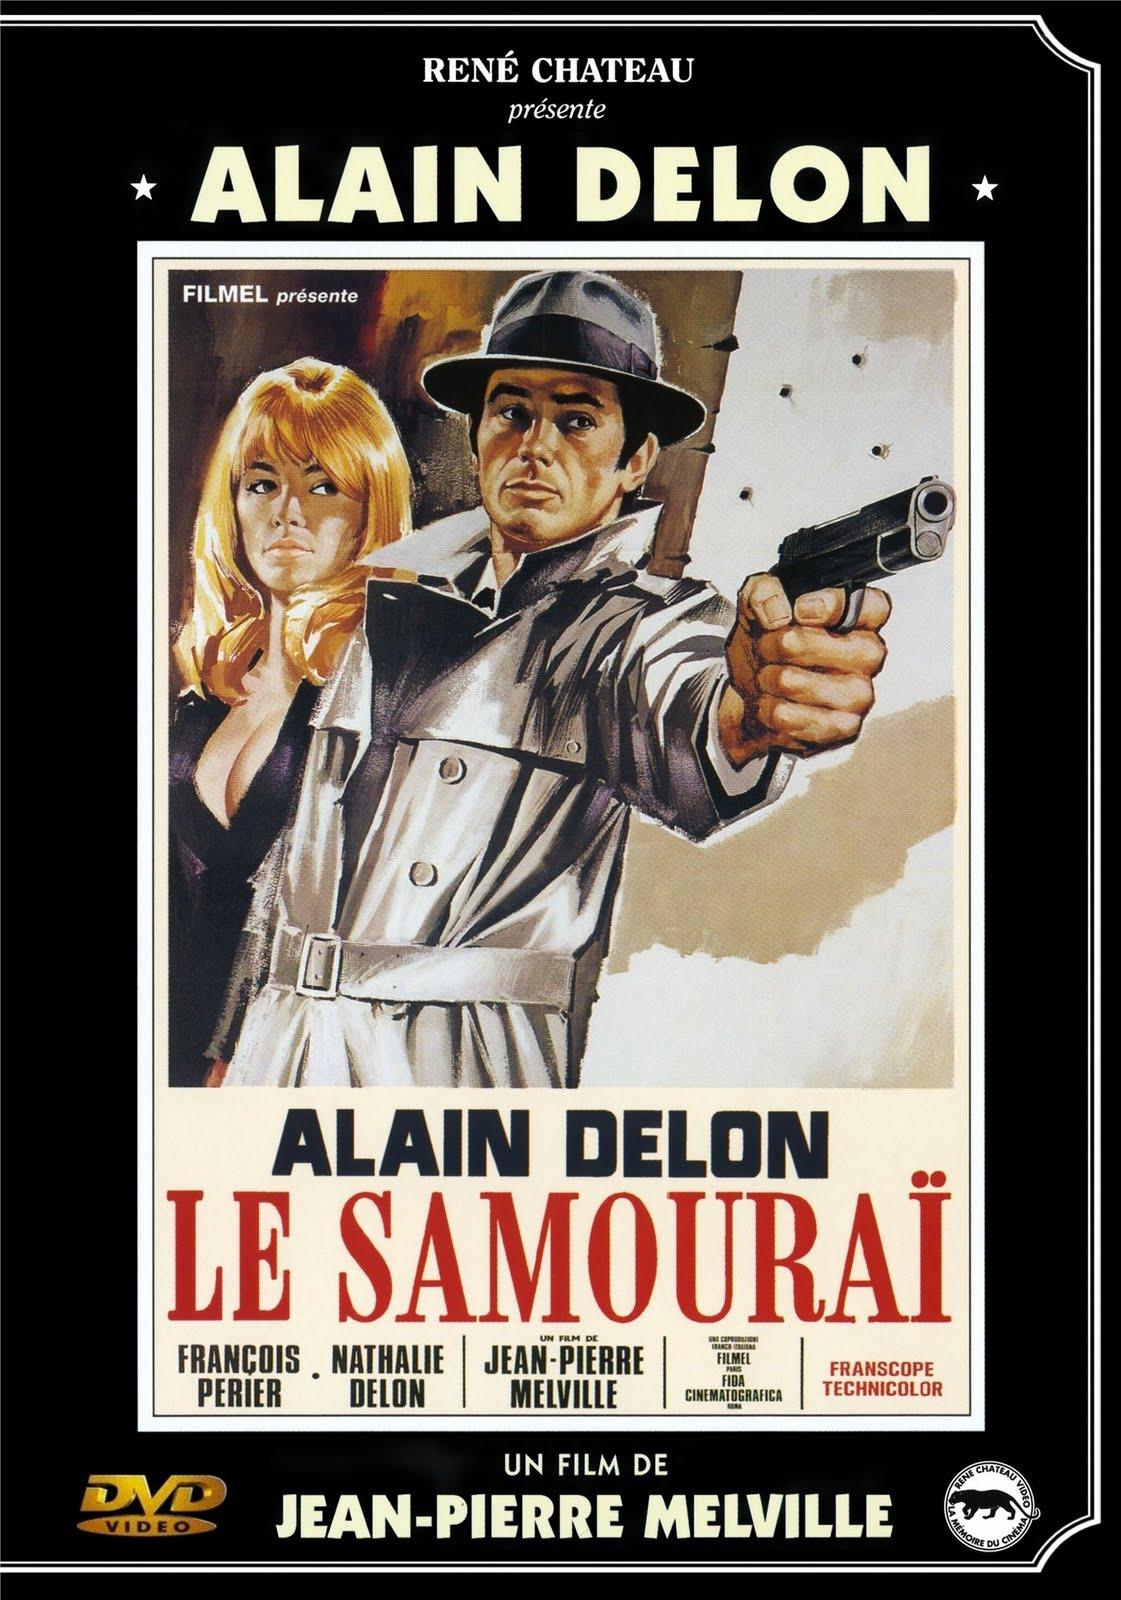 http://3.bp.blogspot.com/-y7IiHA9PsMc/TyuiQAohe-I/AAAAAAAALXY/dWhoKiEicjo/s1600/3286_El+Samurai_El+Silencio+De+Un+Hombre.jpg